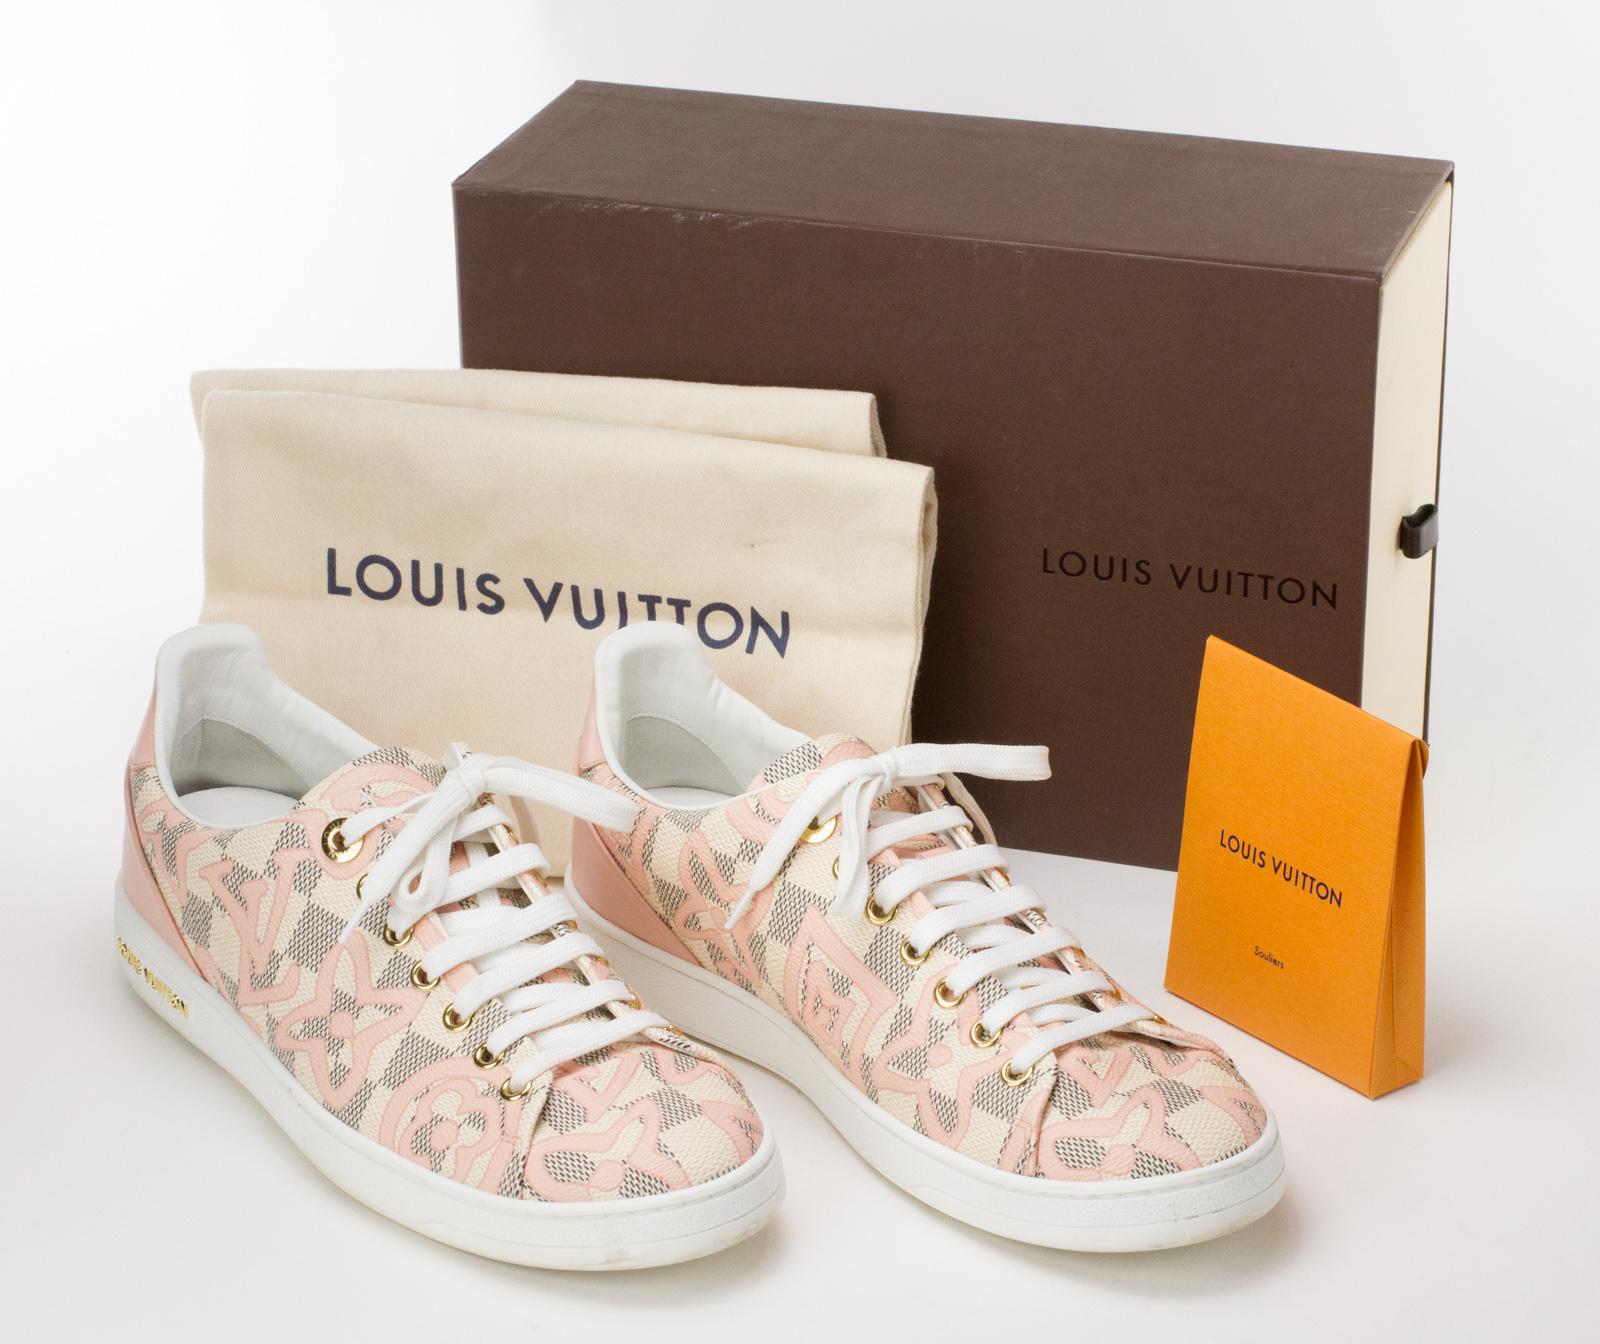 f8c223c4b51c LOUIS VUITTON Pink Cream   White Damier Azur Tahitienne Bora Bora Sneakers